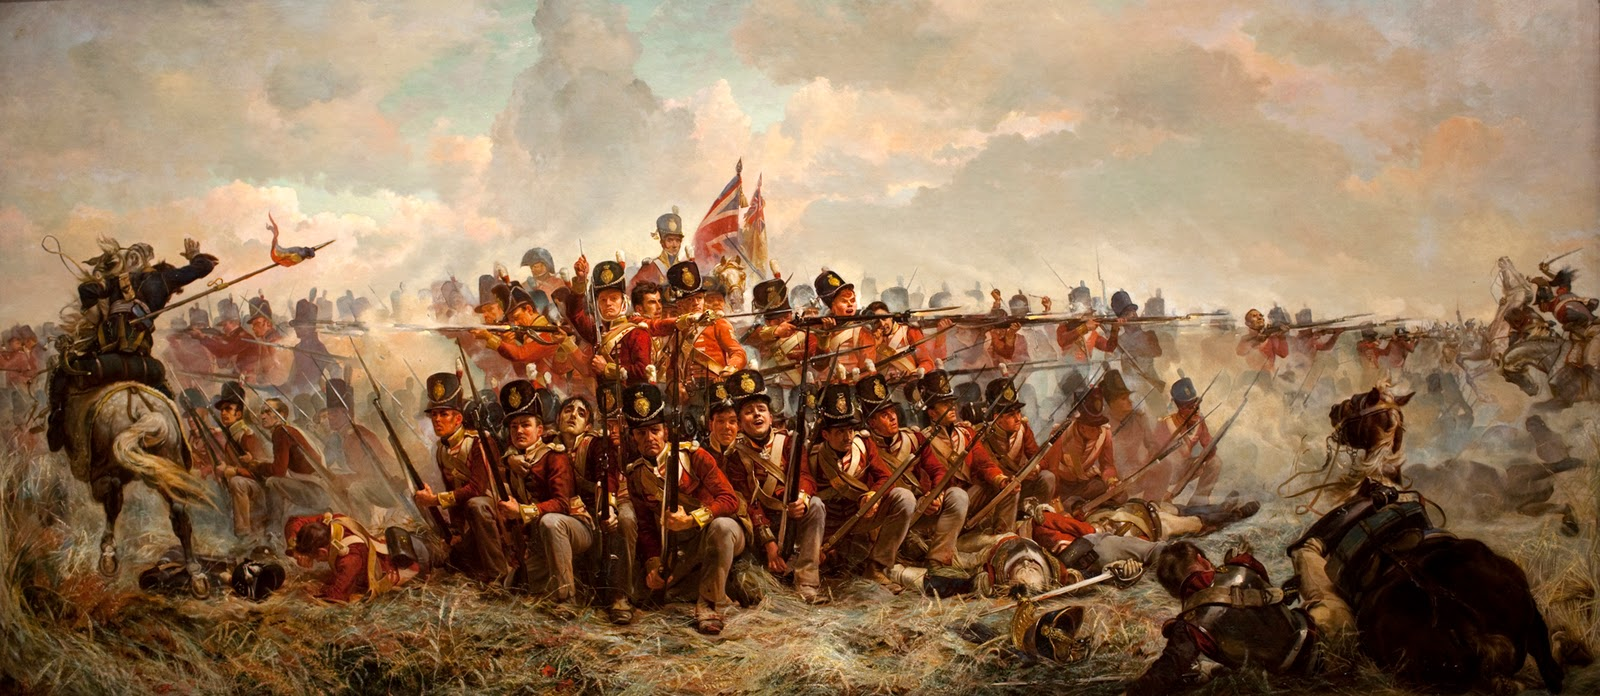 Royal_Infantry.jpg